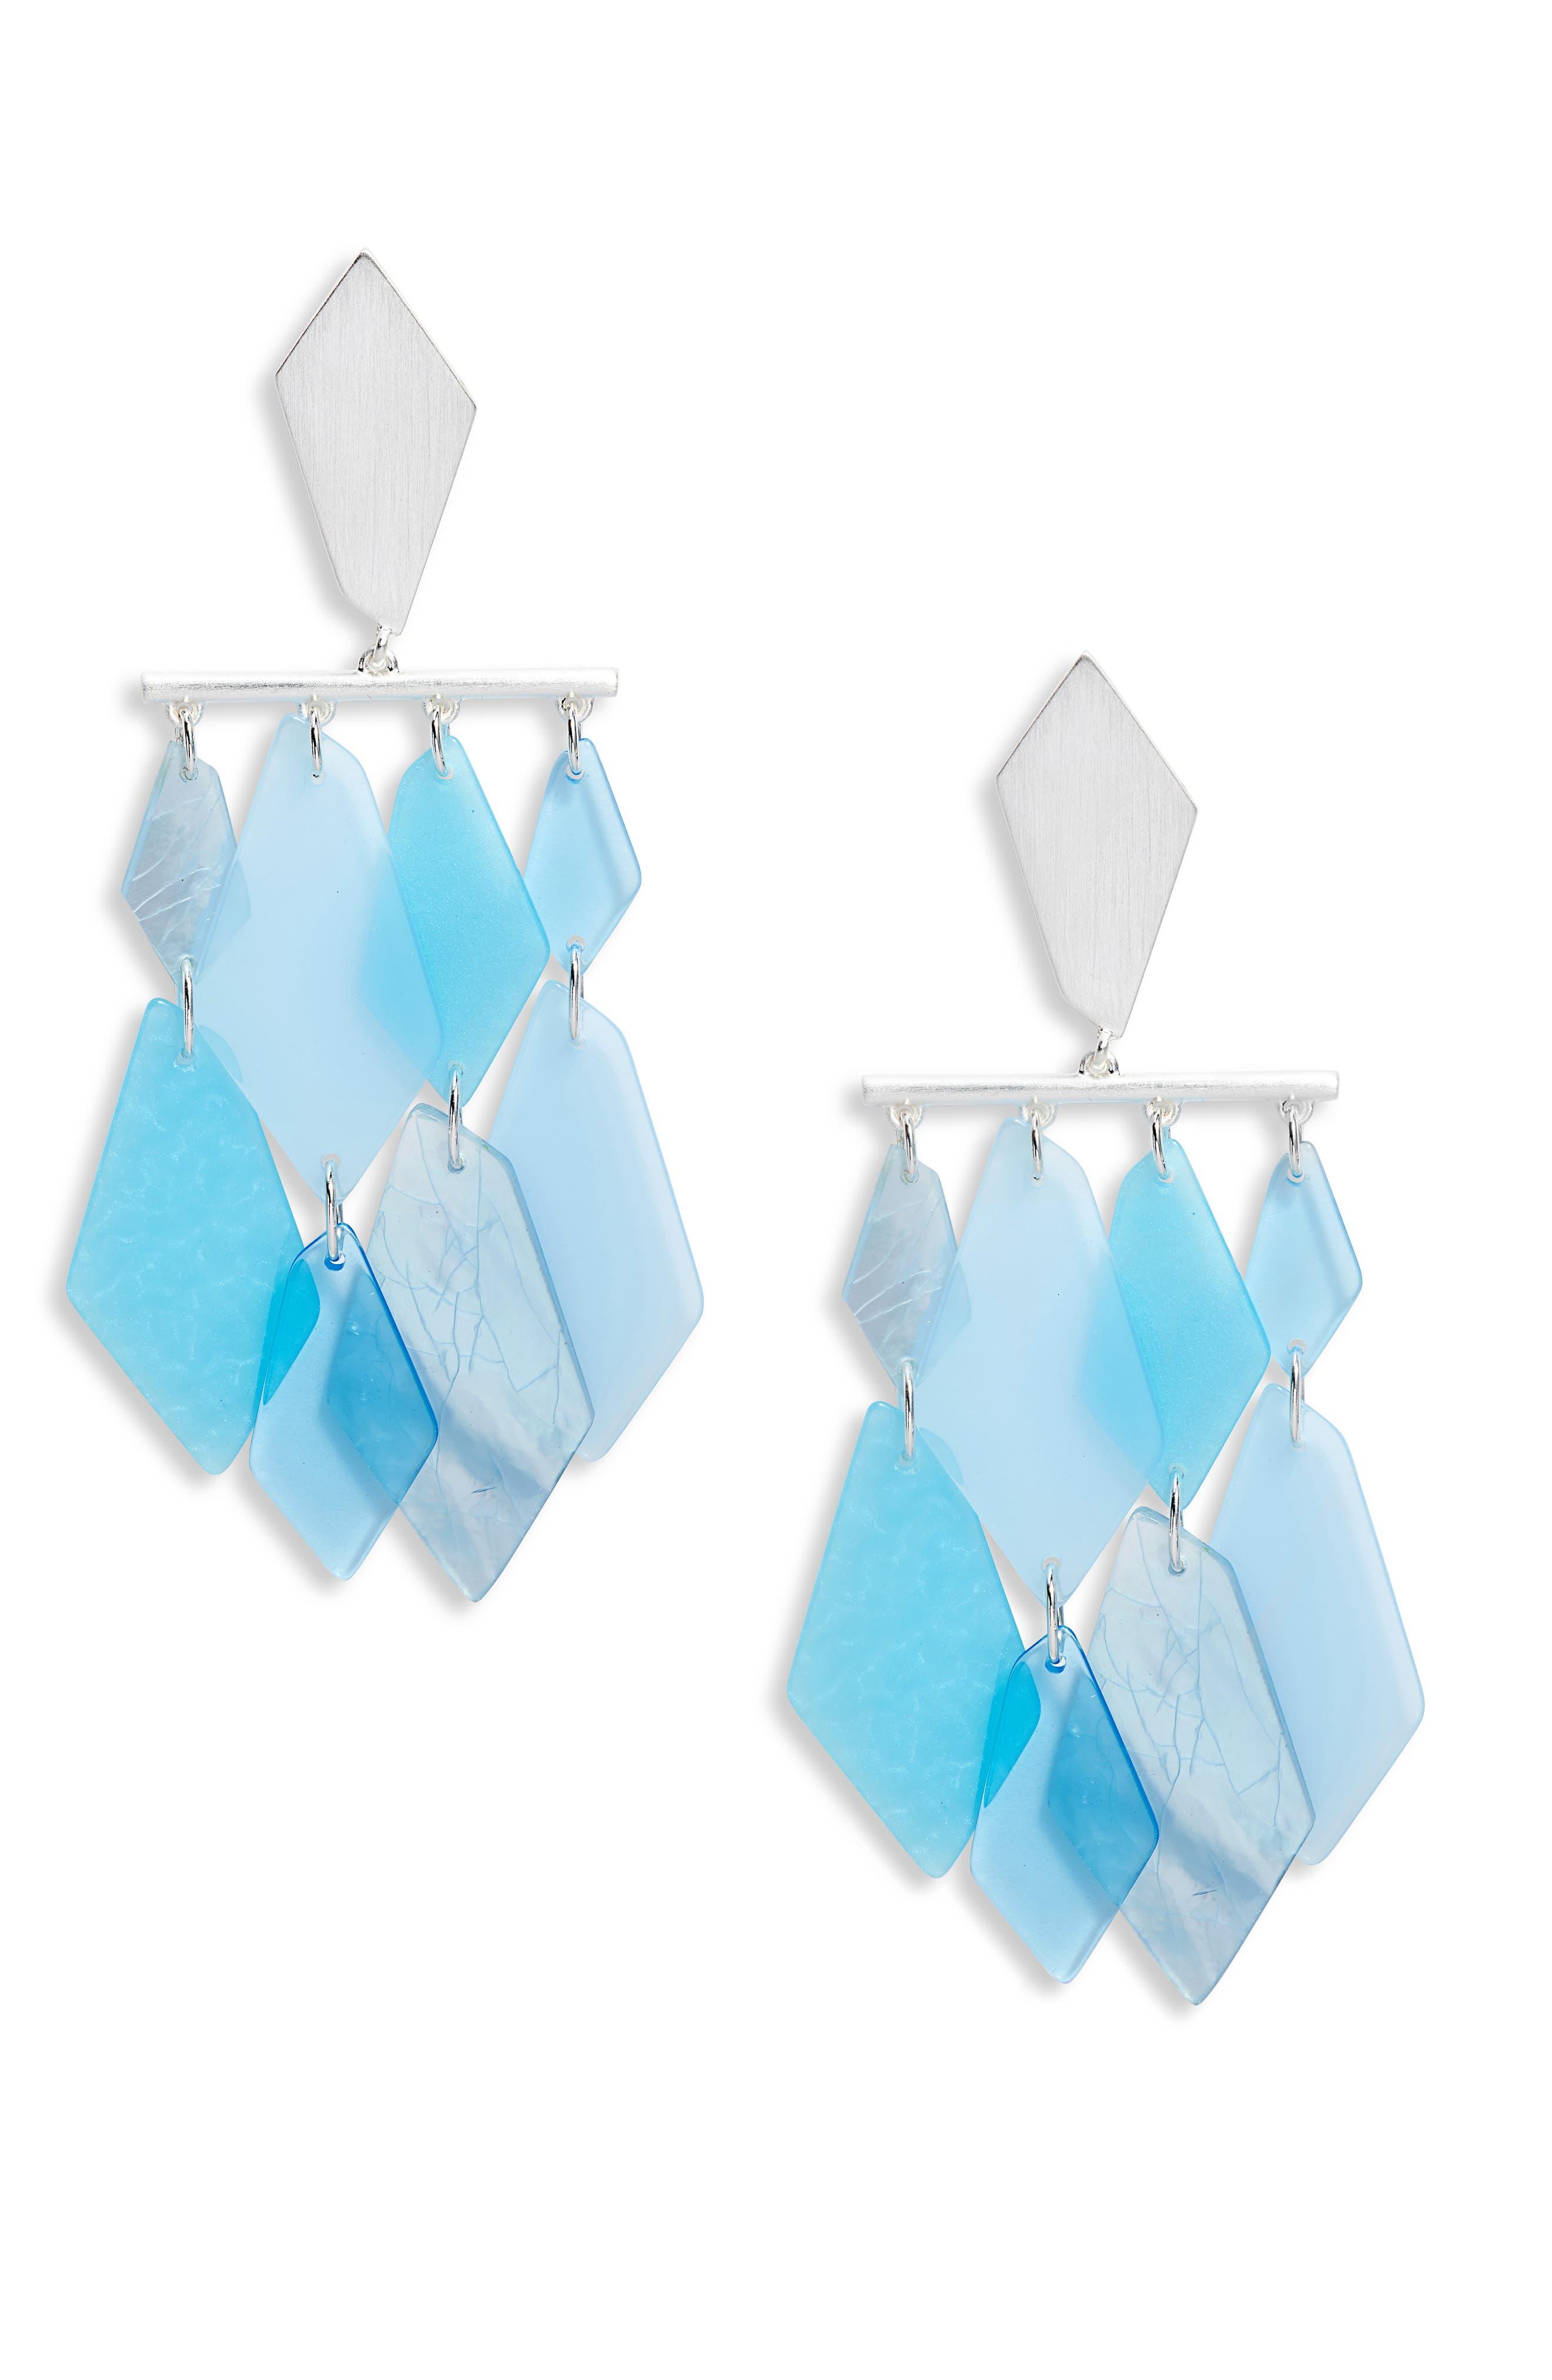 KENDRA SCOTT,                             Hanna Earrings,                             Main thumbnail 1, color,                             SKY BLUE MIX/ SILVER